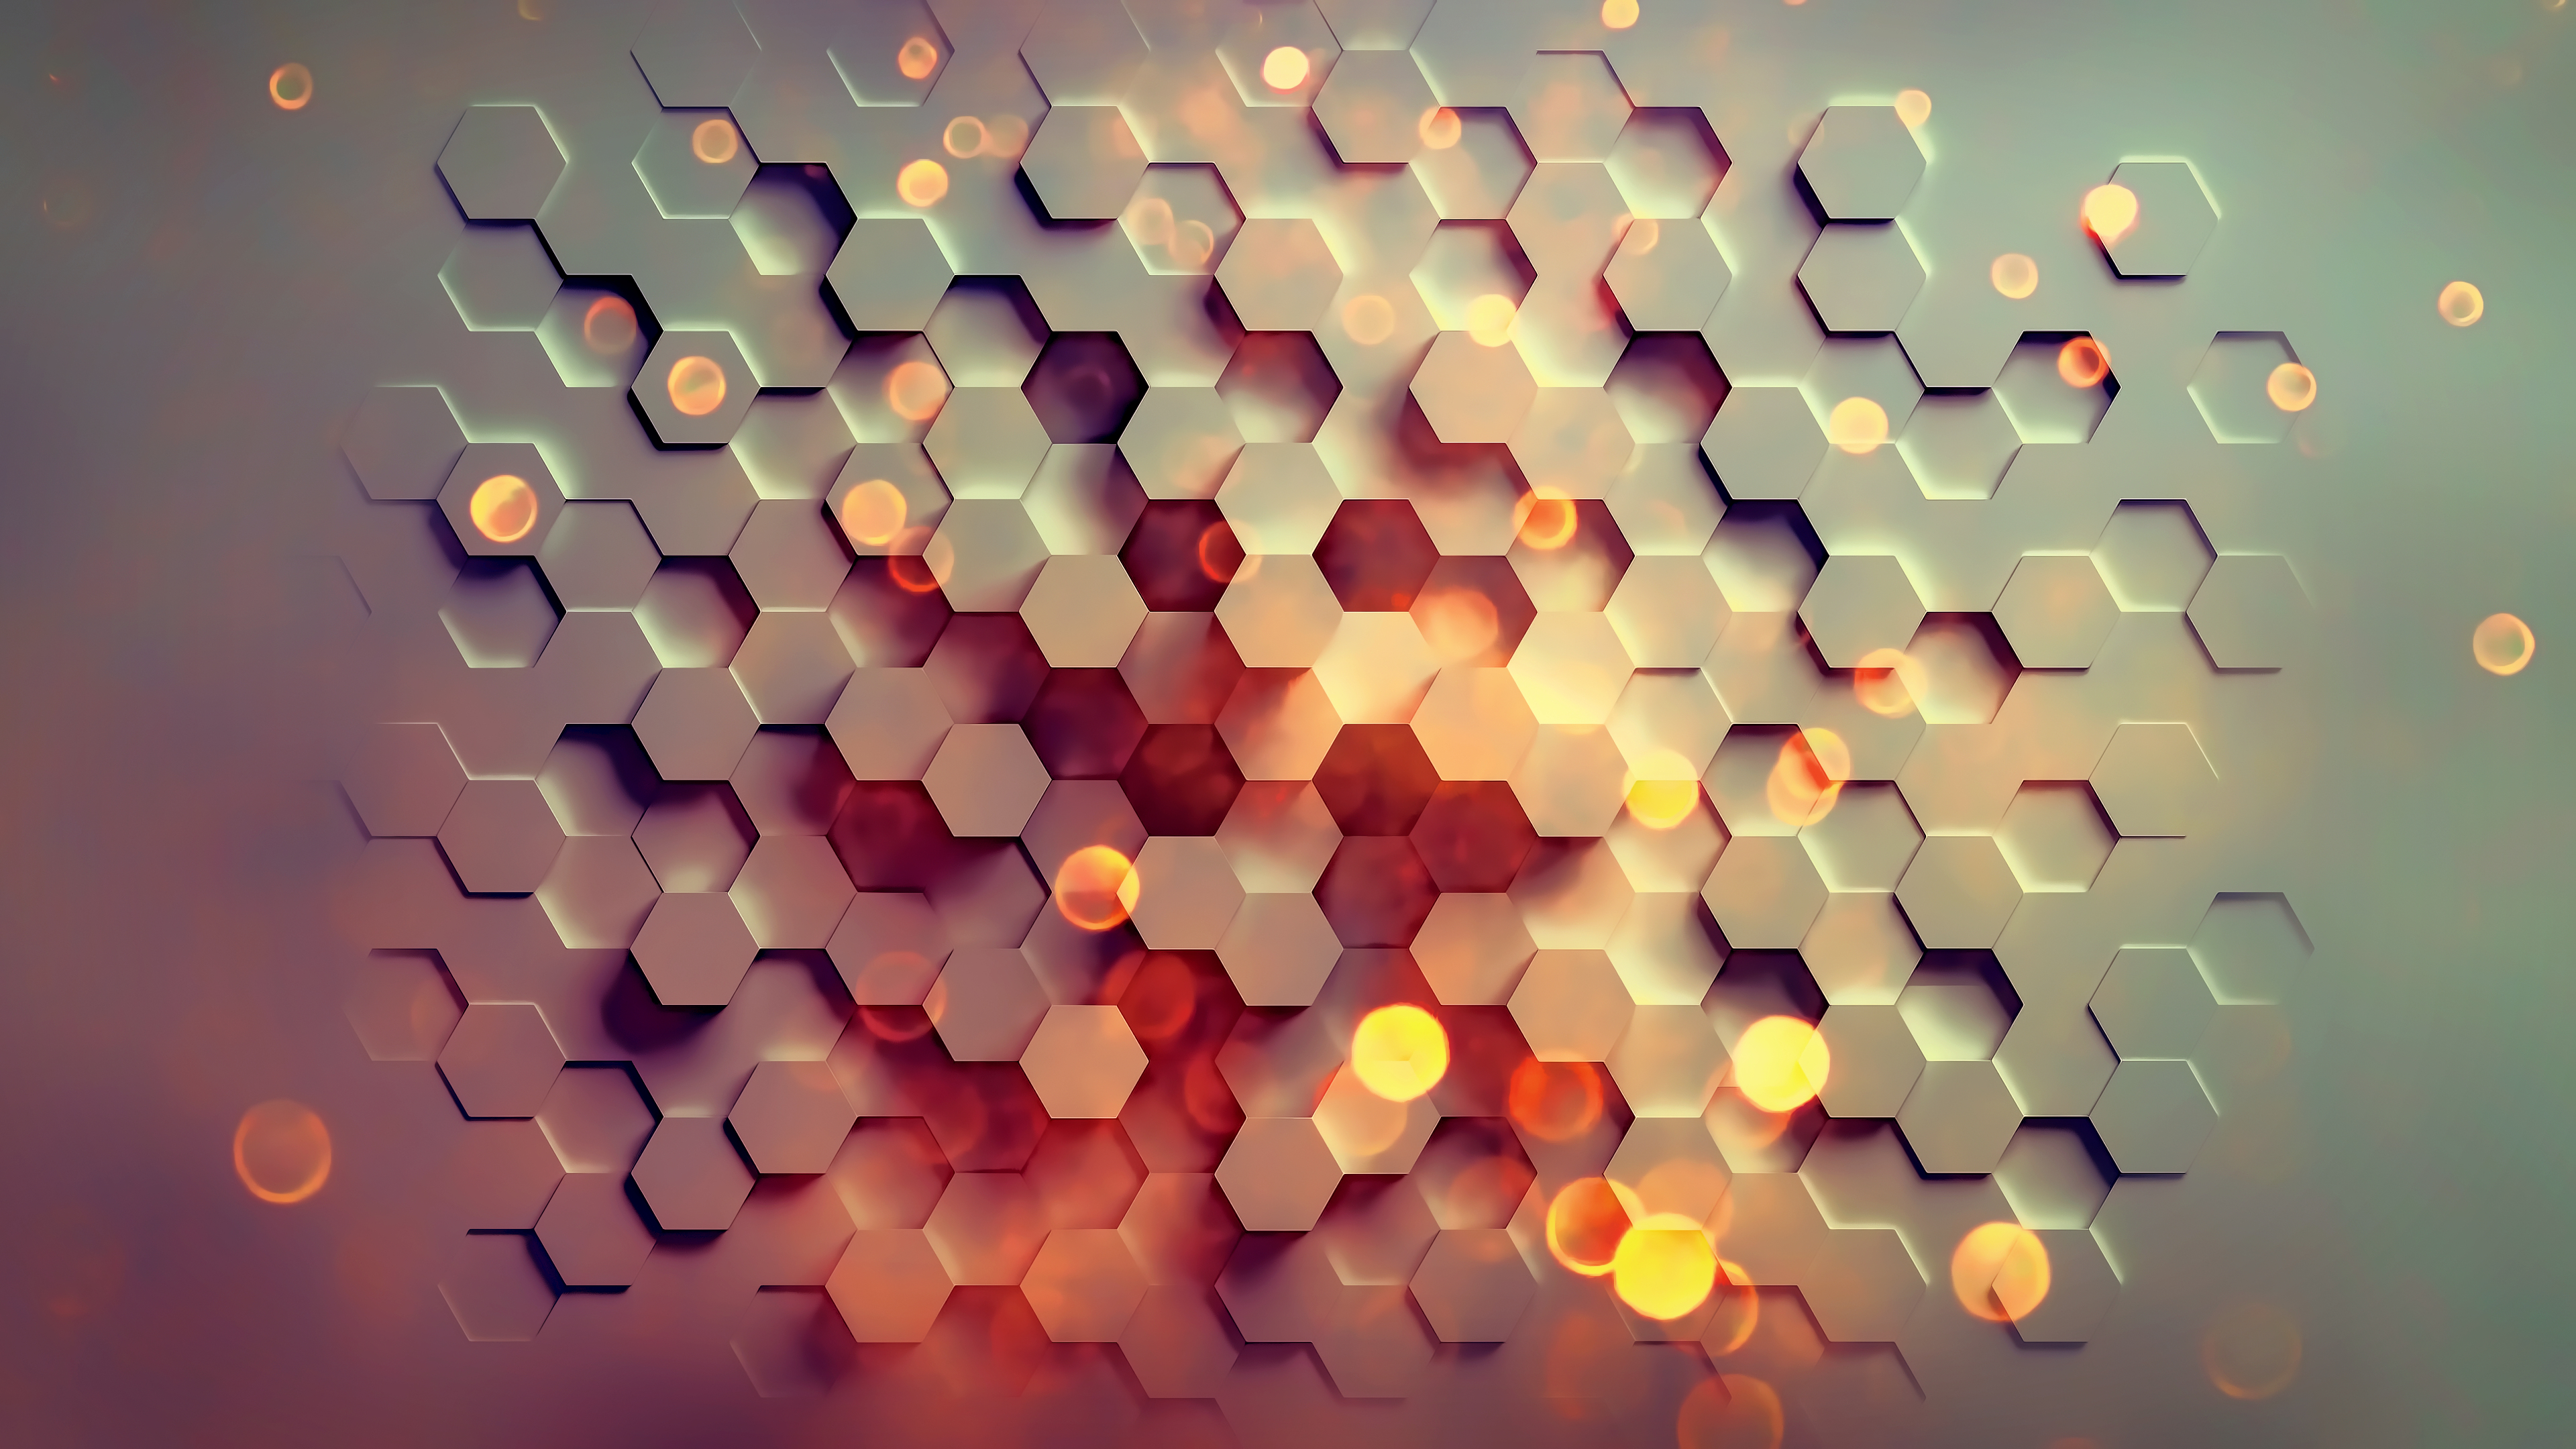 hexagon 4k 1539371039 - Hexagon 4k - hexagon wallpapers, hd-wallpapers, abstract wallpapers, 4k-wallpapers